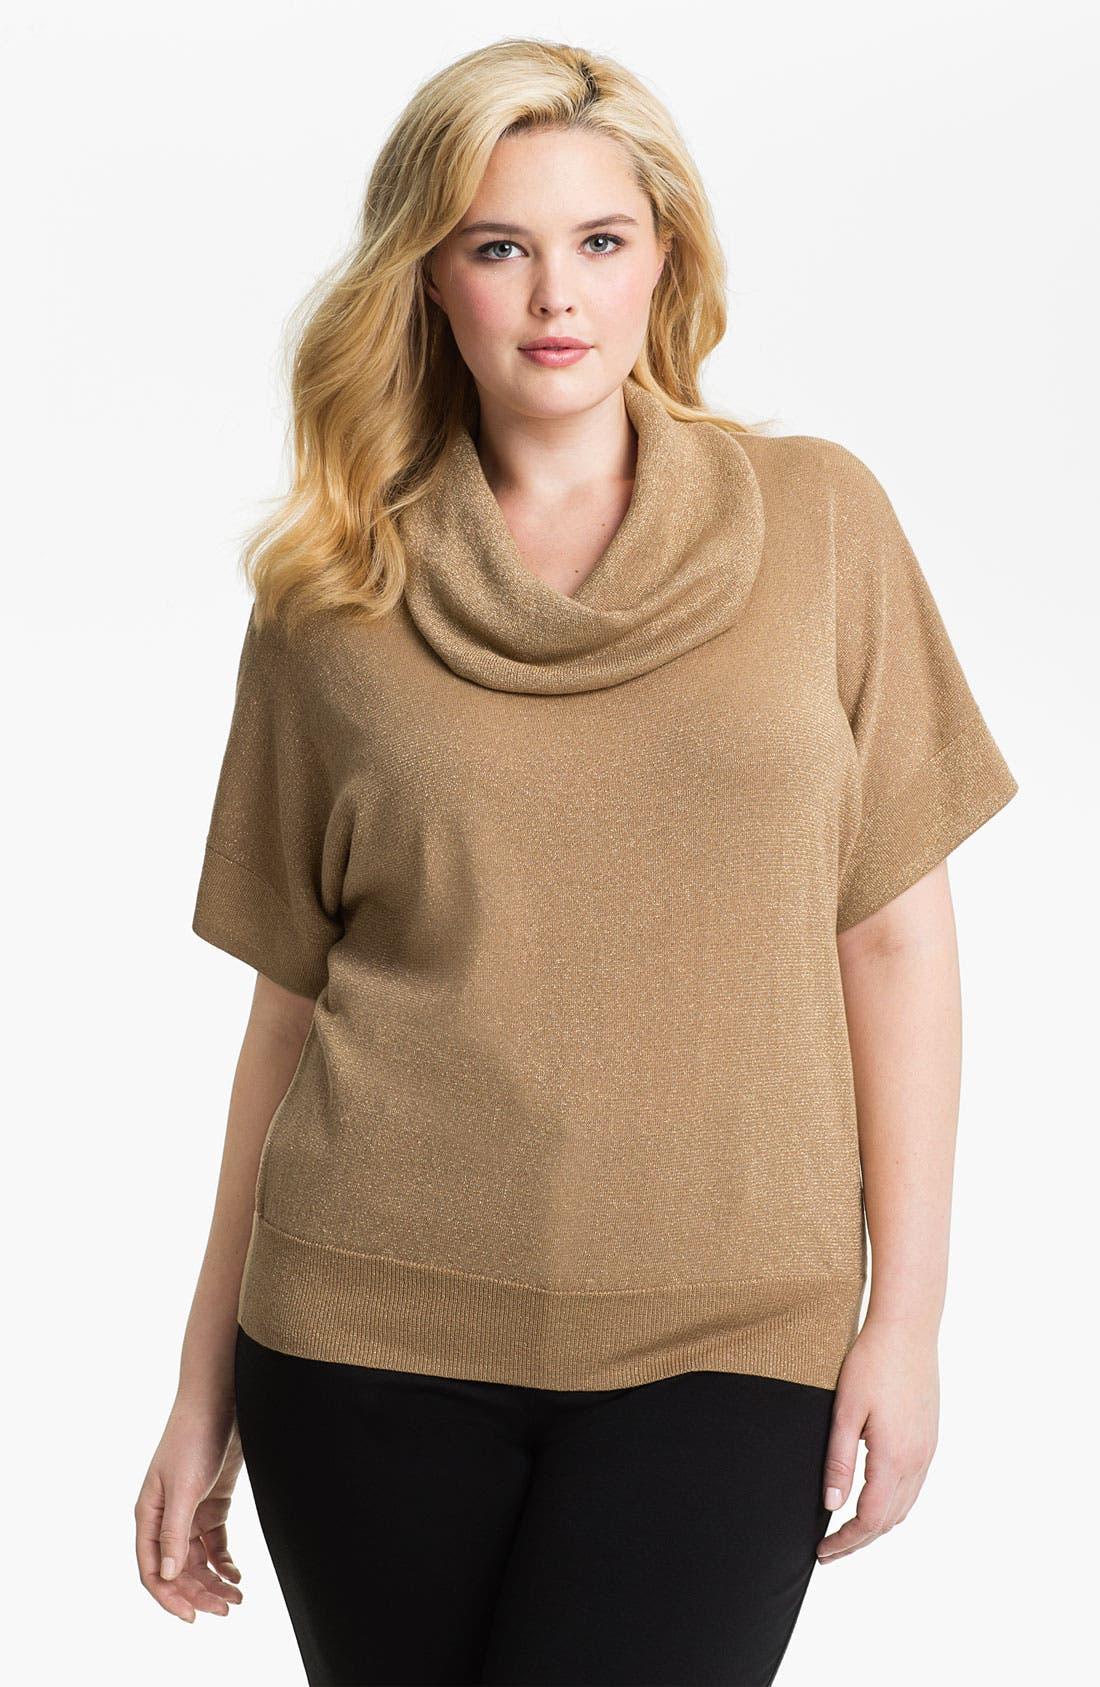 Alternate Image 1 Selected - MICHAEL Michael Kors Metallic Cowl Neck Sweater (Plus)